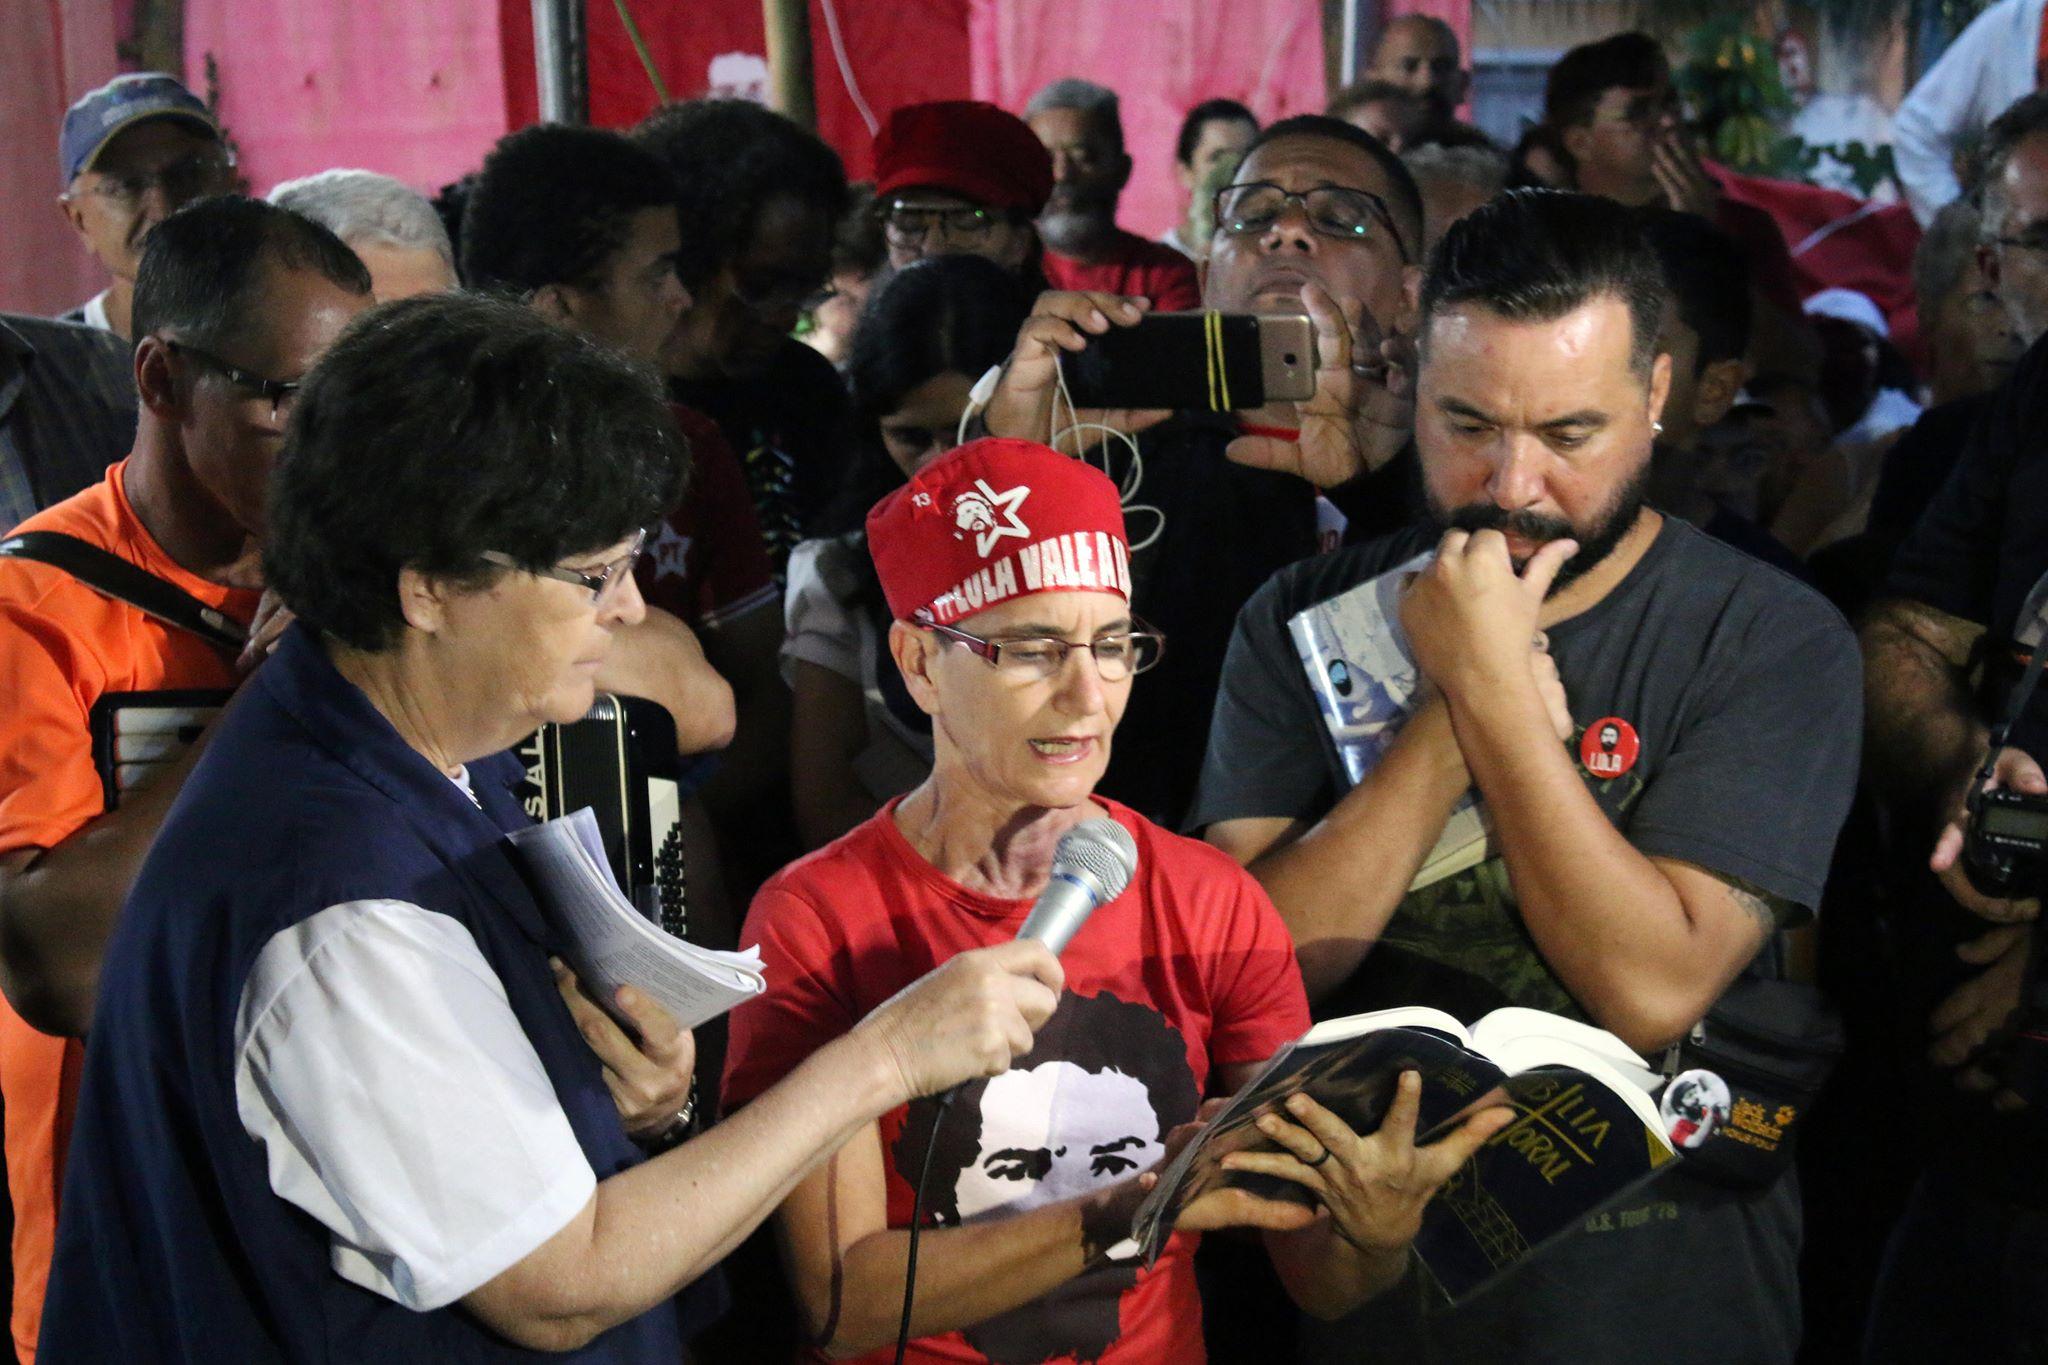 FOTO21-Jornalistas Livres